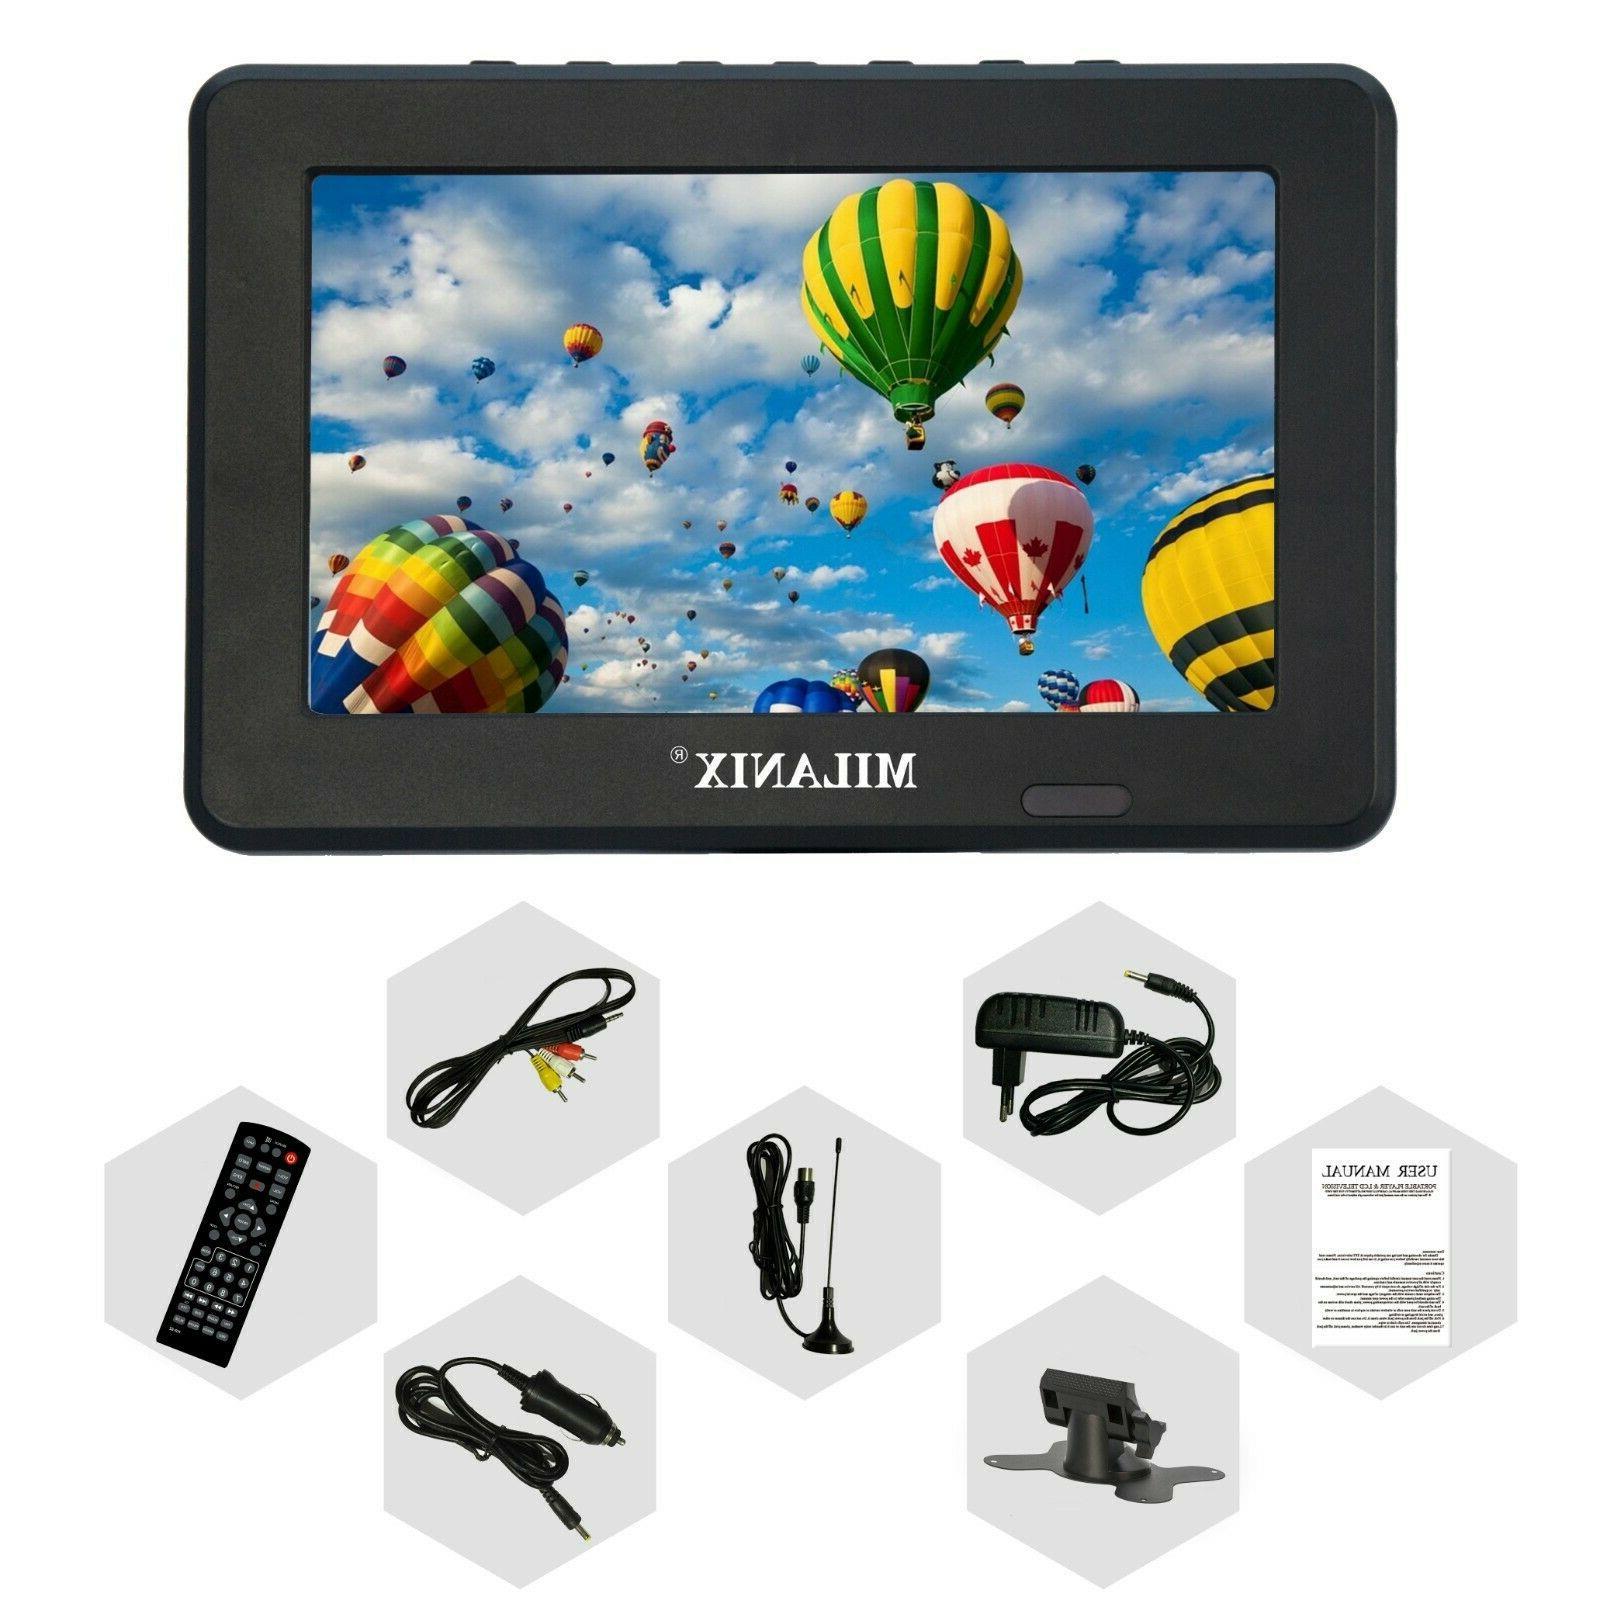 Milanix LCD w/ Digital TV Tuner & SD & In